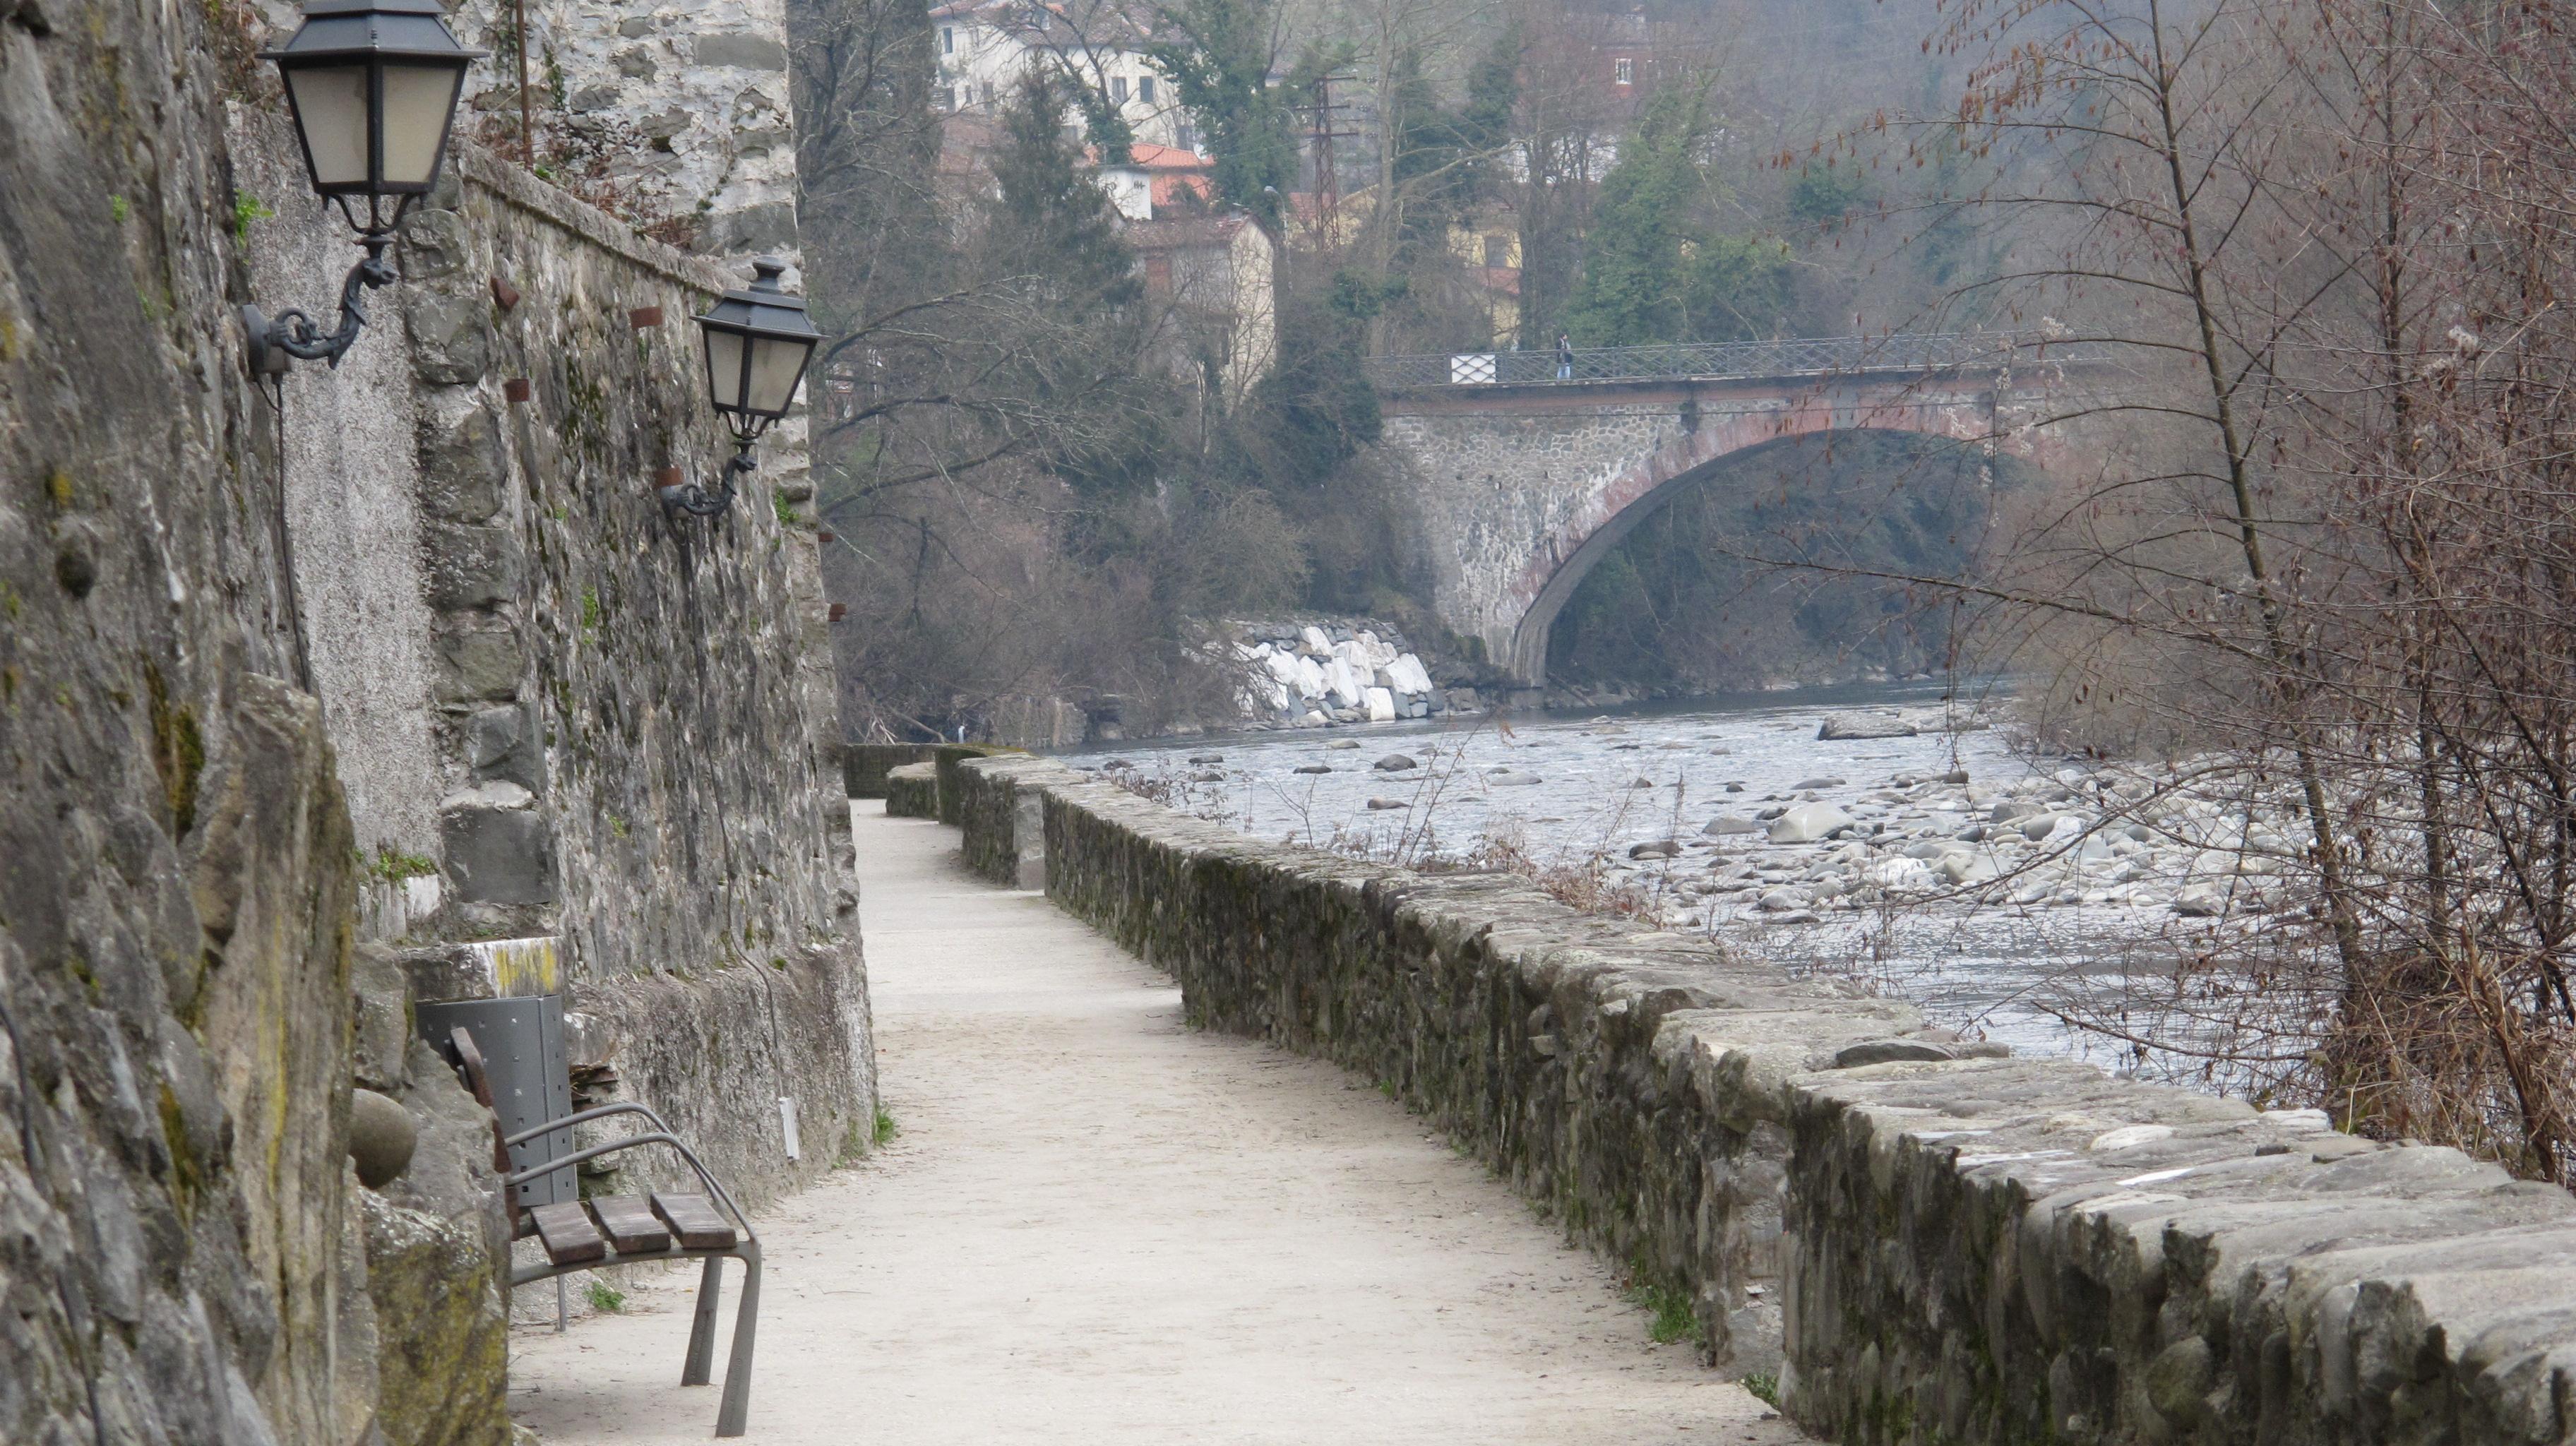 Lovers\' walk | Bagni di Lucca and Beyond